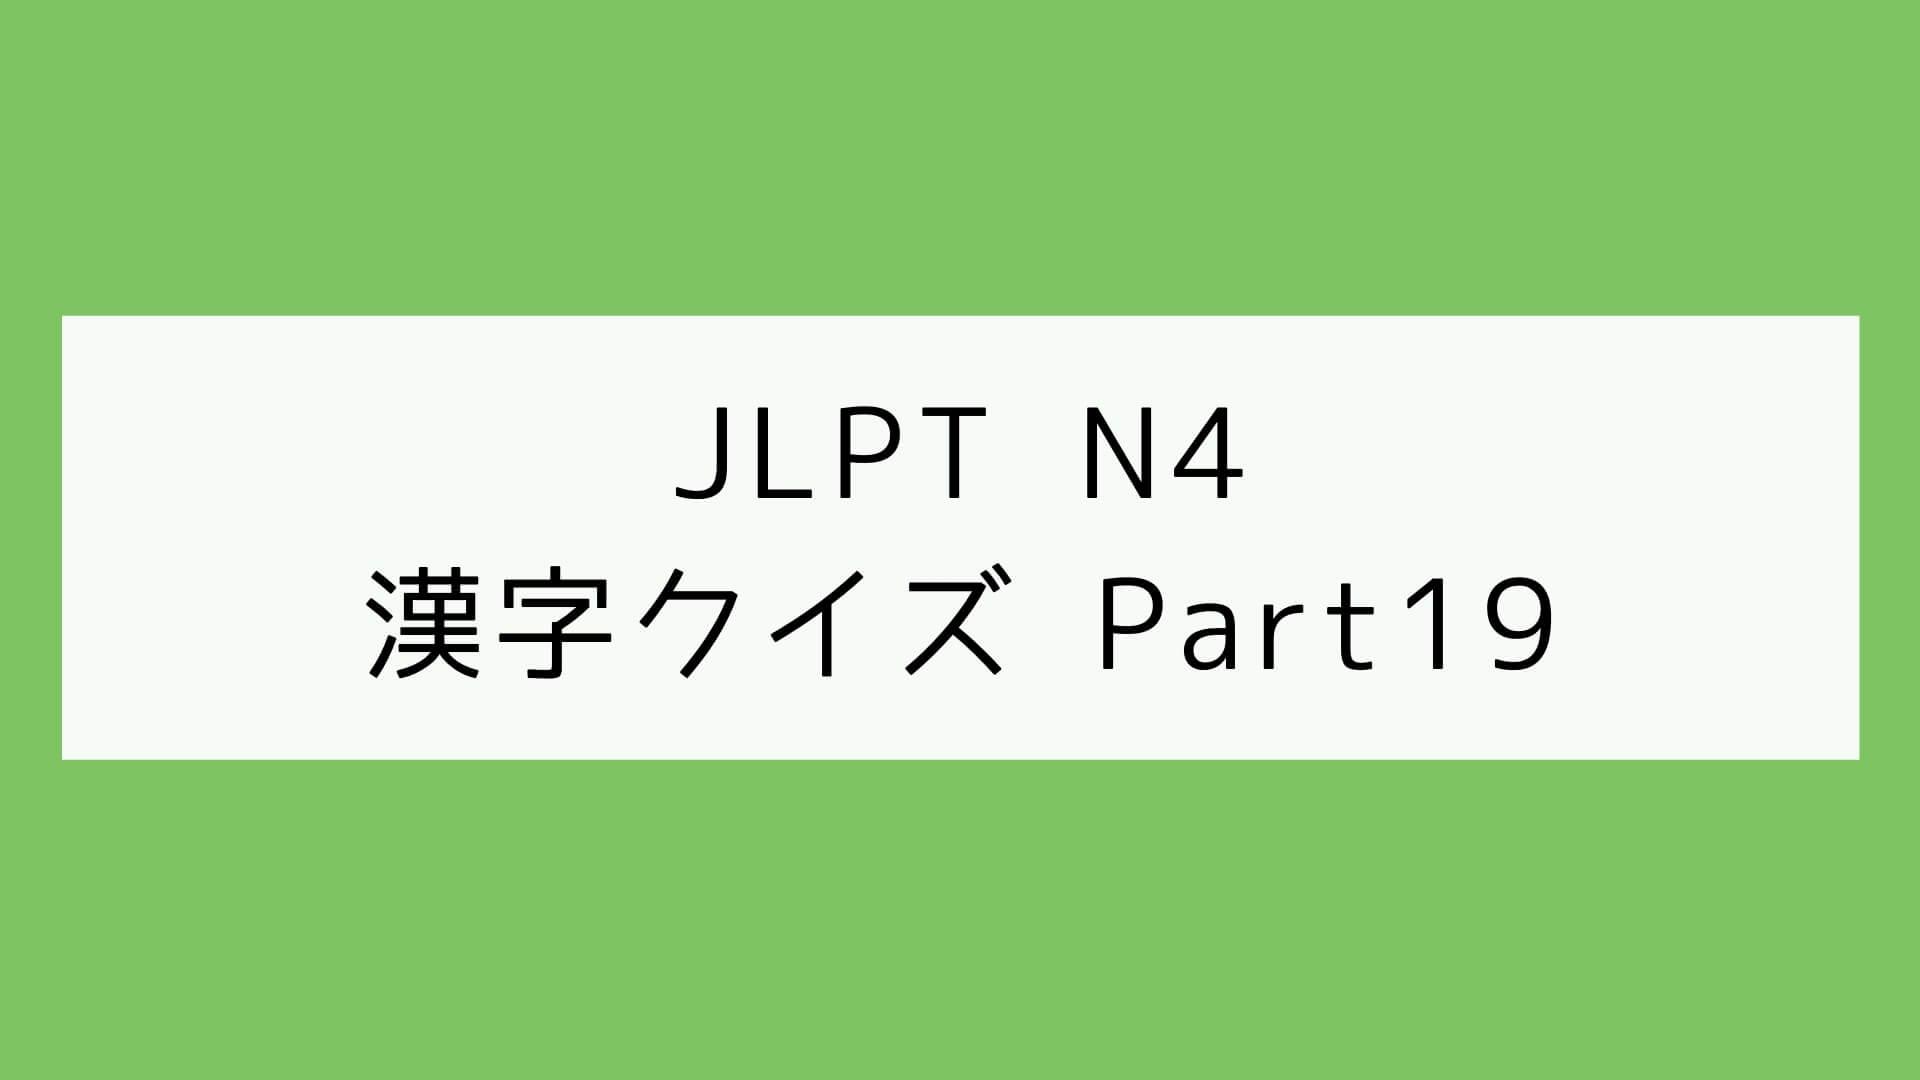 【JLPT N4】漢字クイズ Part19